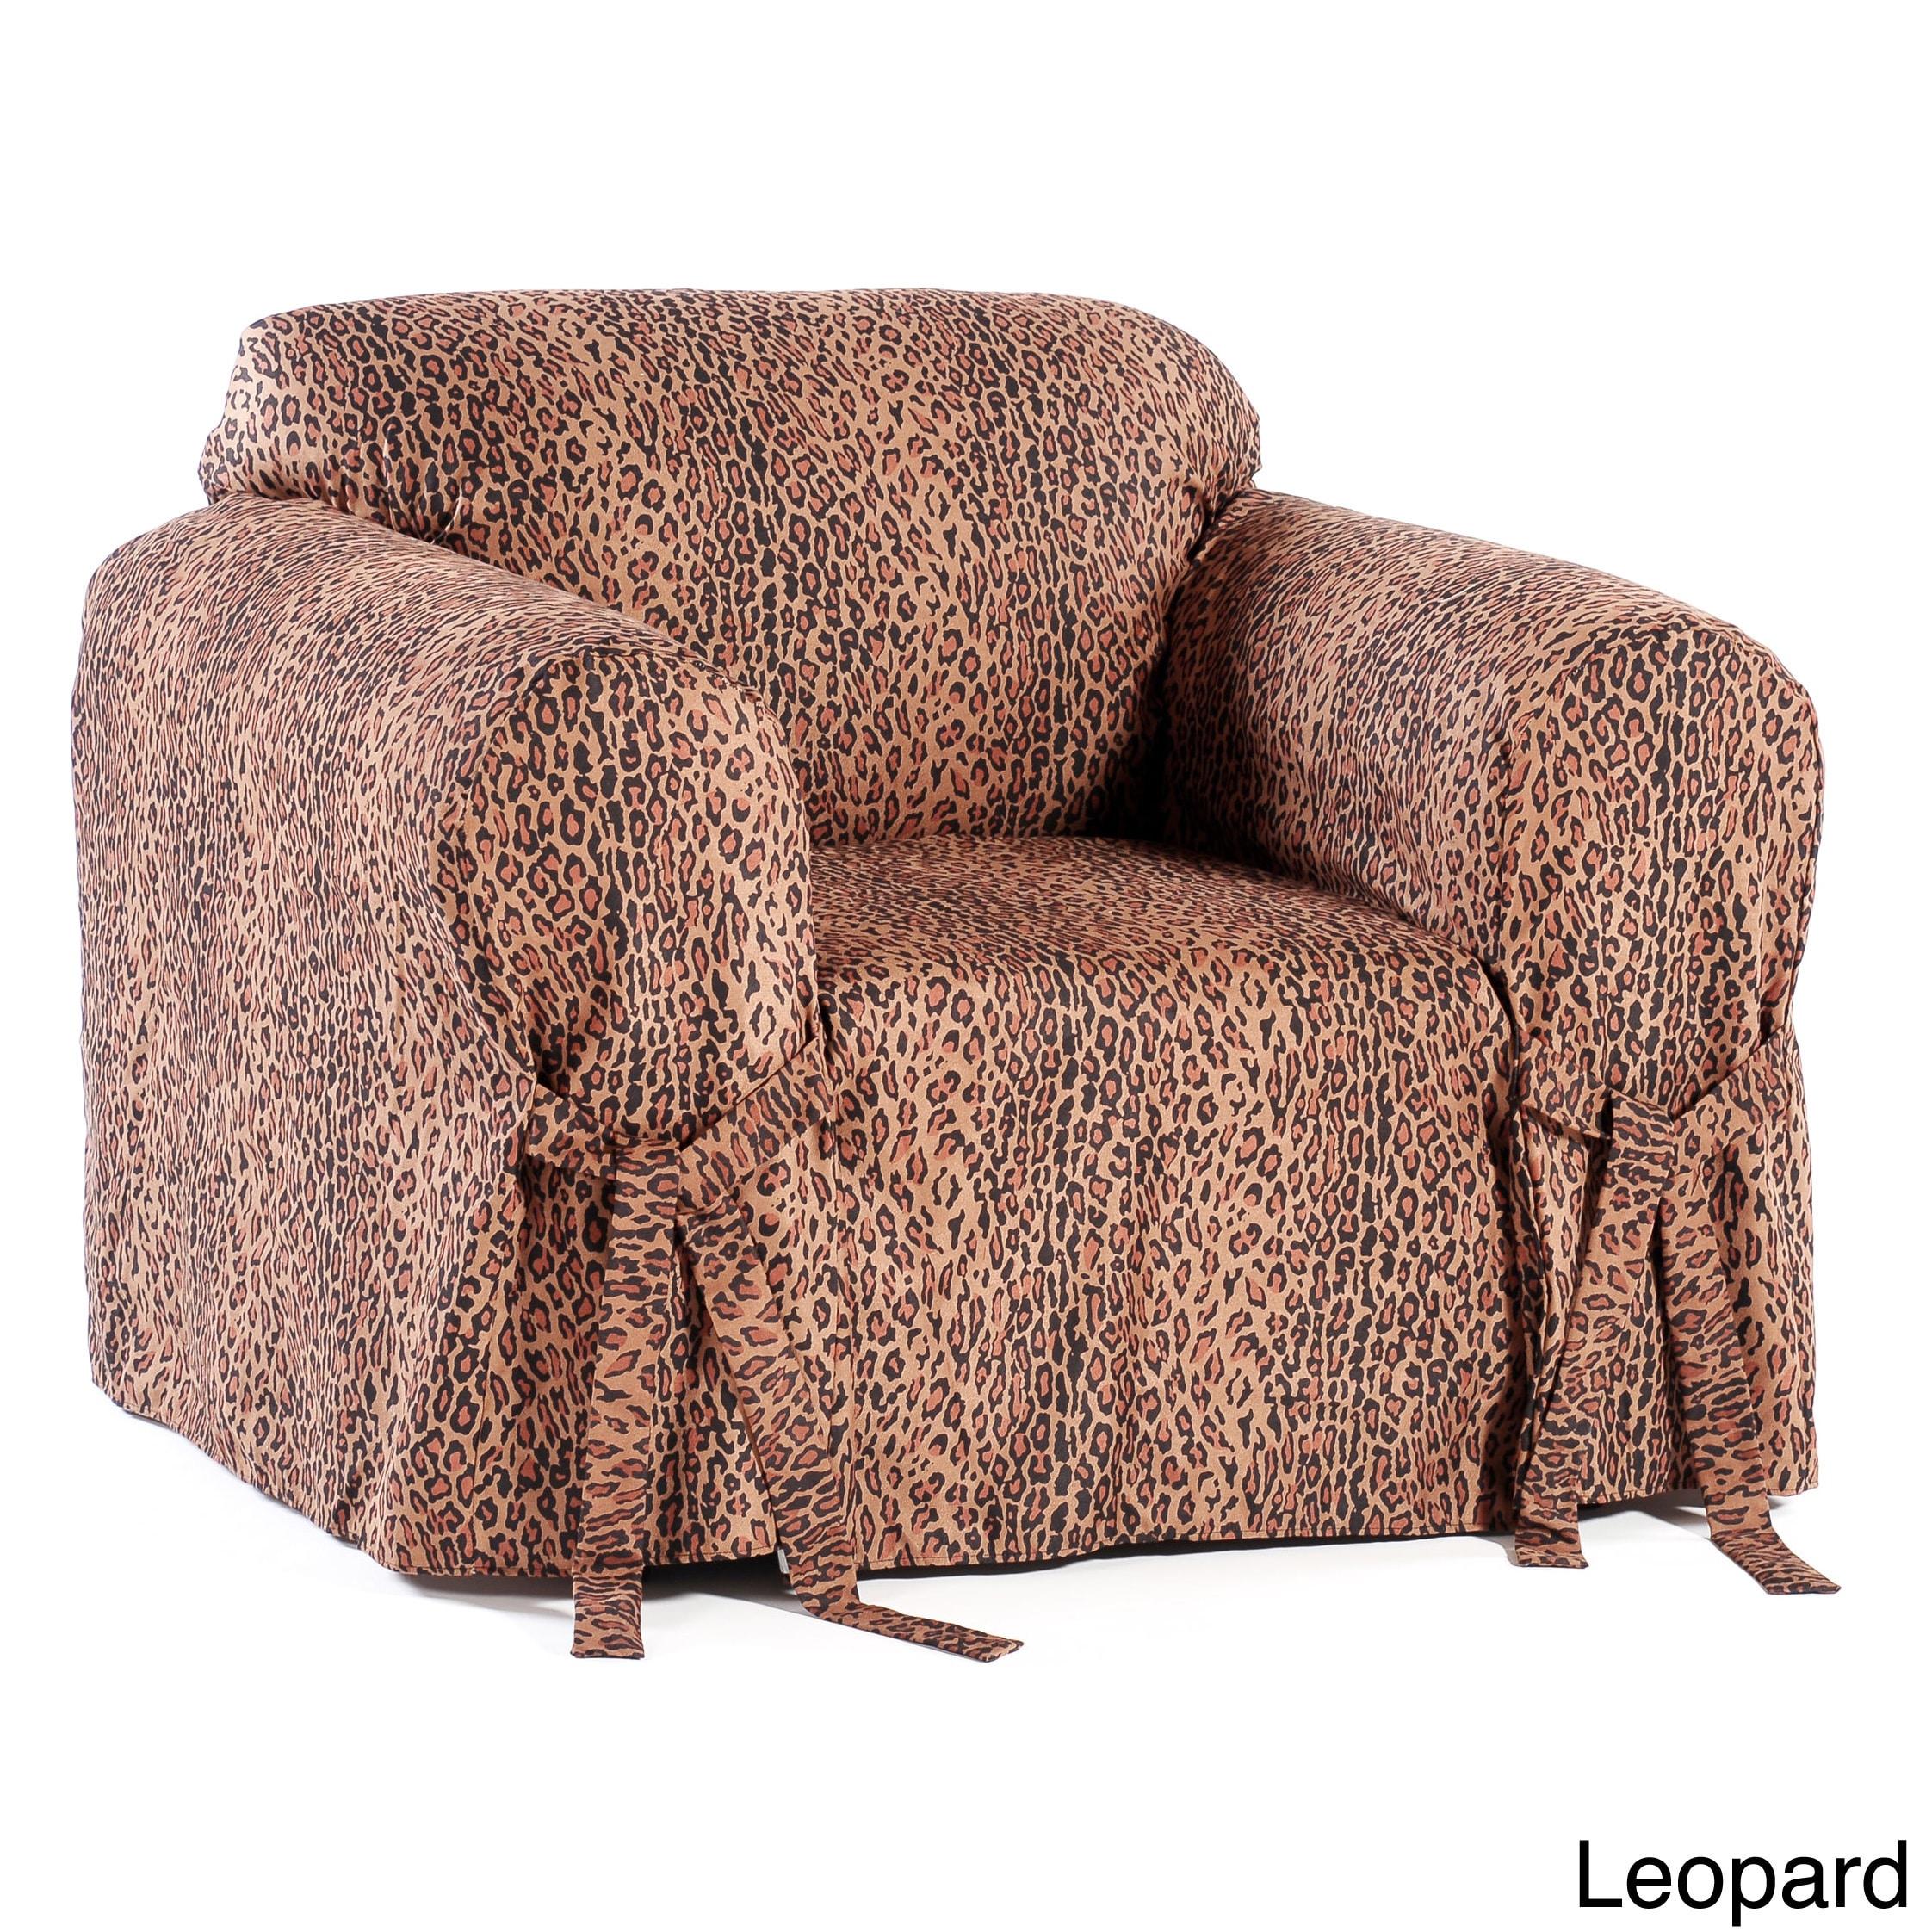 Animal Print Chairs